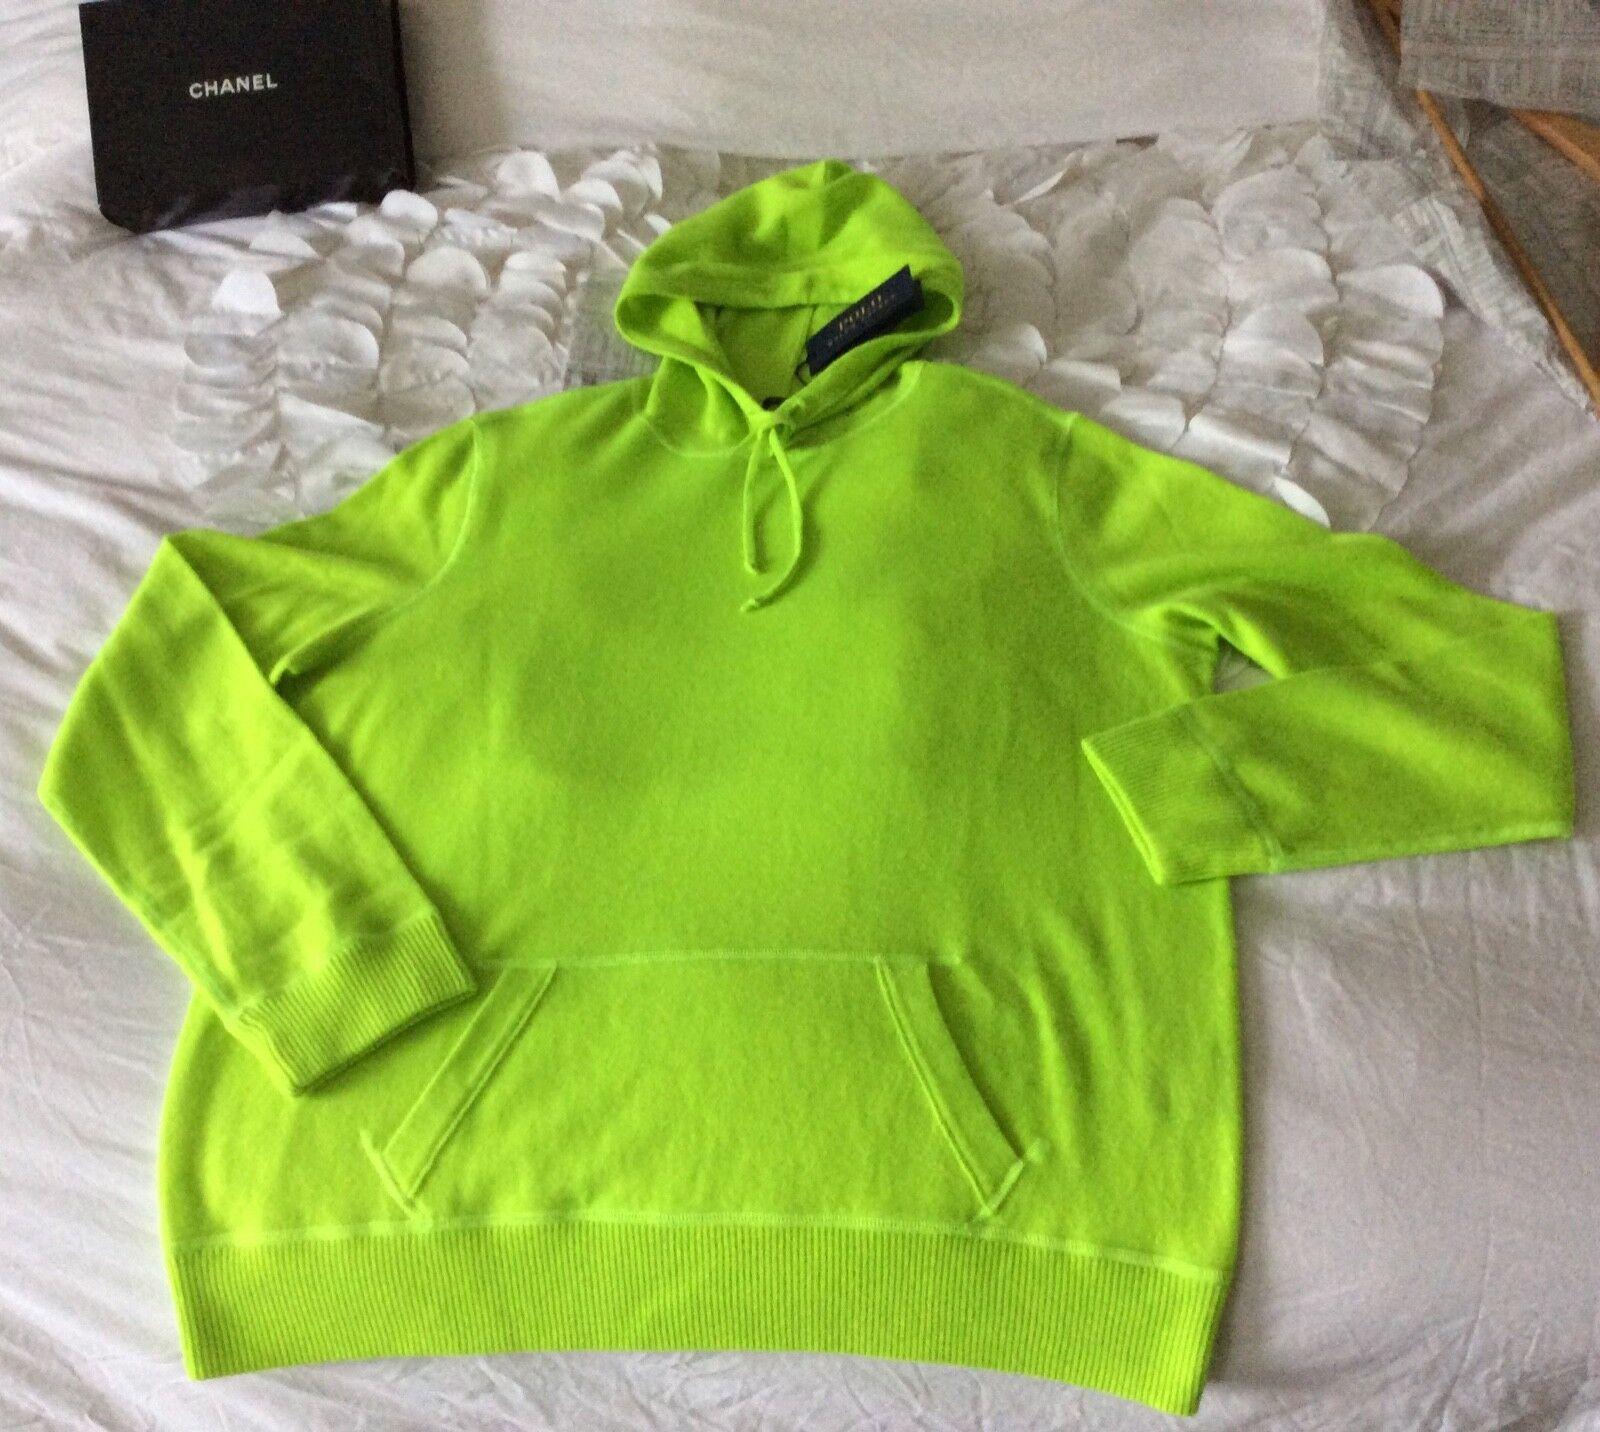 Ralph Lauren 100% cashmere hooded long jumper XL new tags fabulous Xmas gift